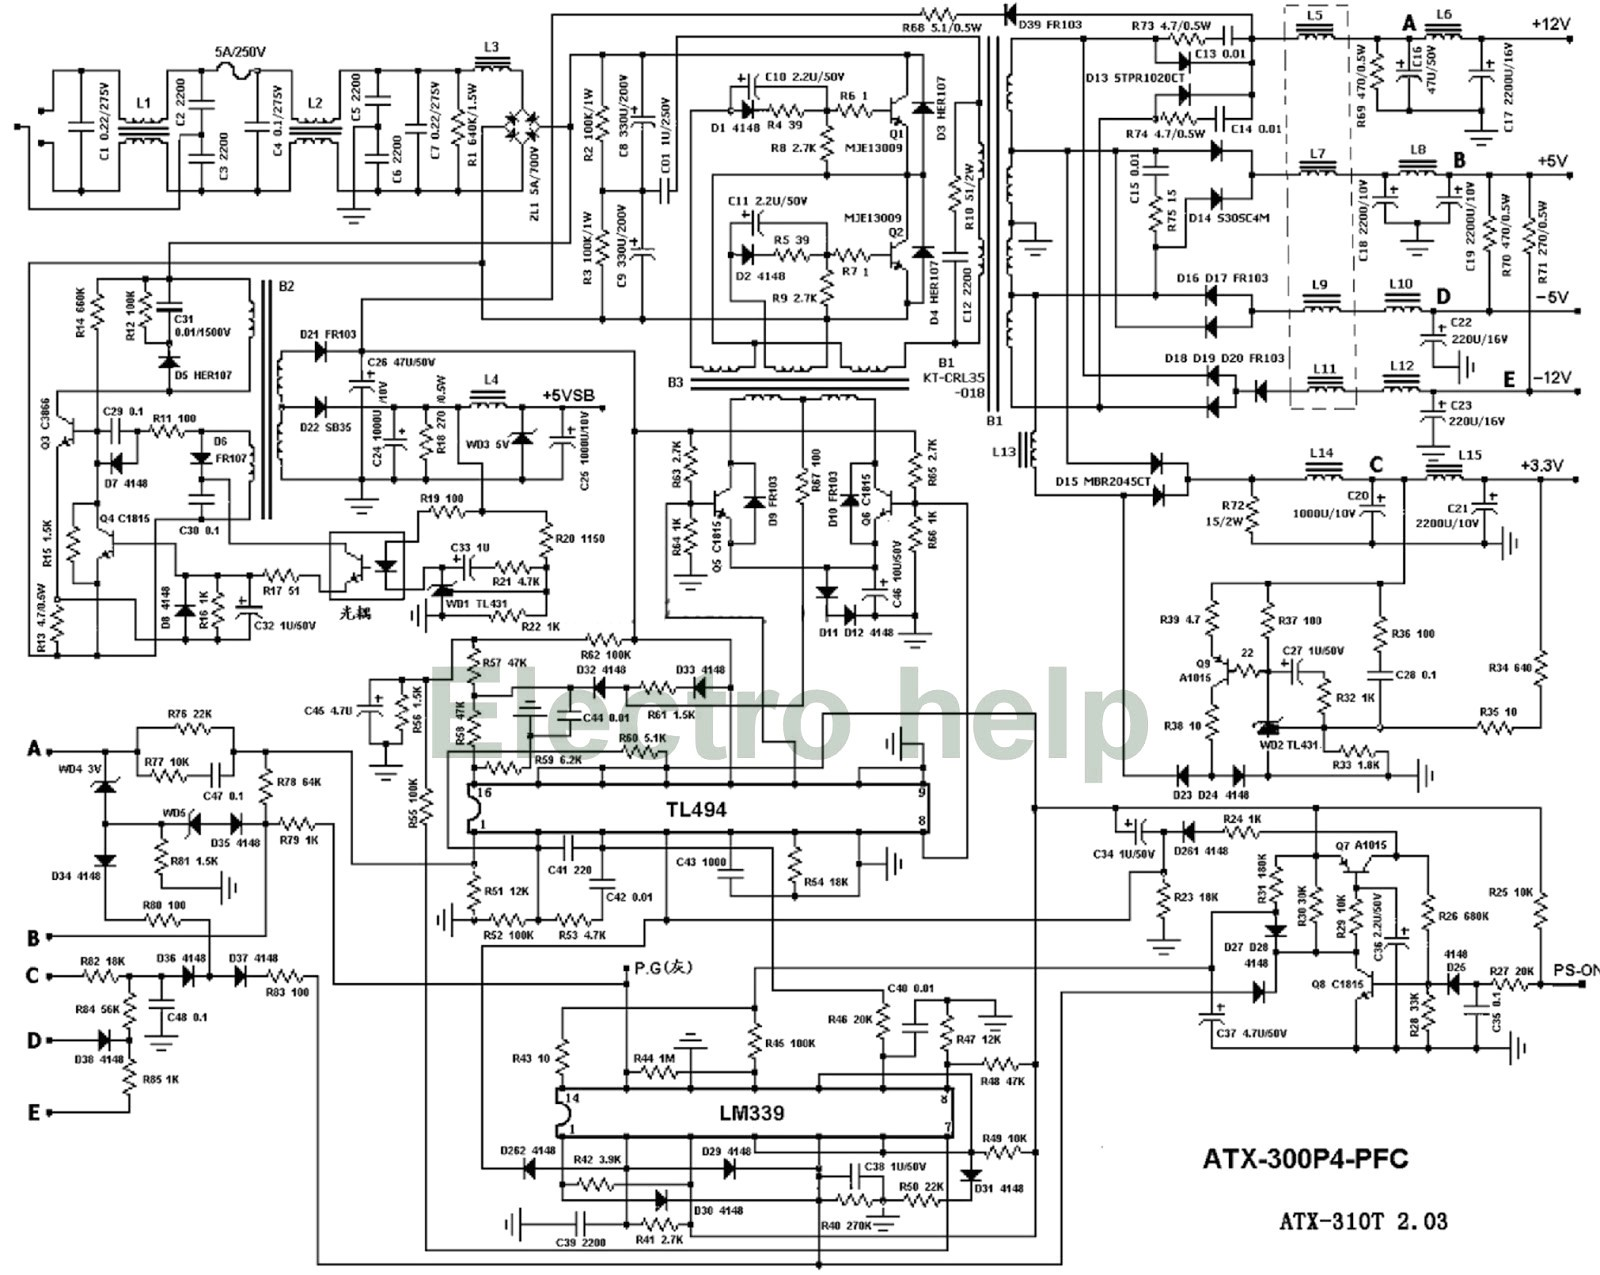 images?q=tbn:ANd9GcQh_l3eQ5xwiPy07kGEXjmjgmBKBRB7H2mRxCGhv1tFWg5c_mWT Pc Wiring Diagram